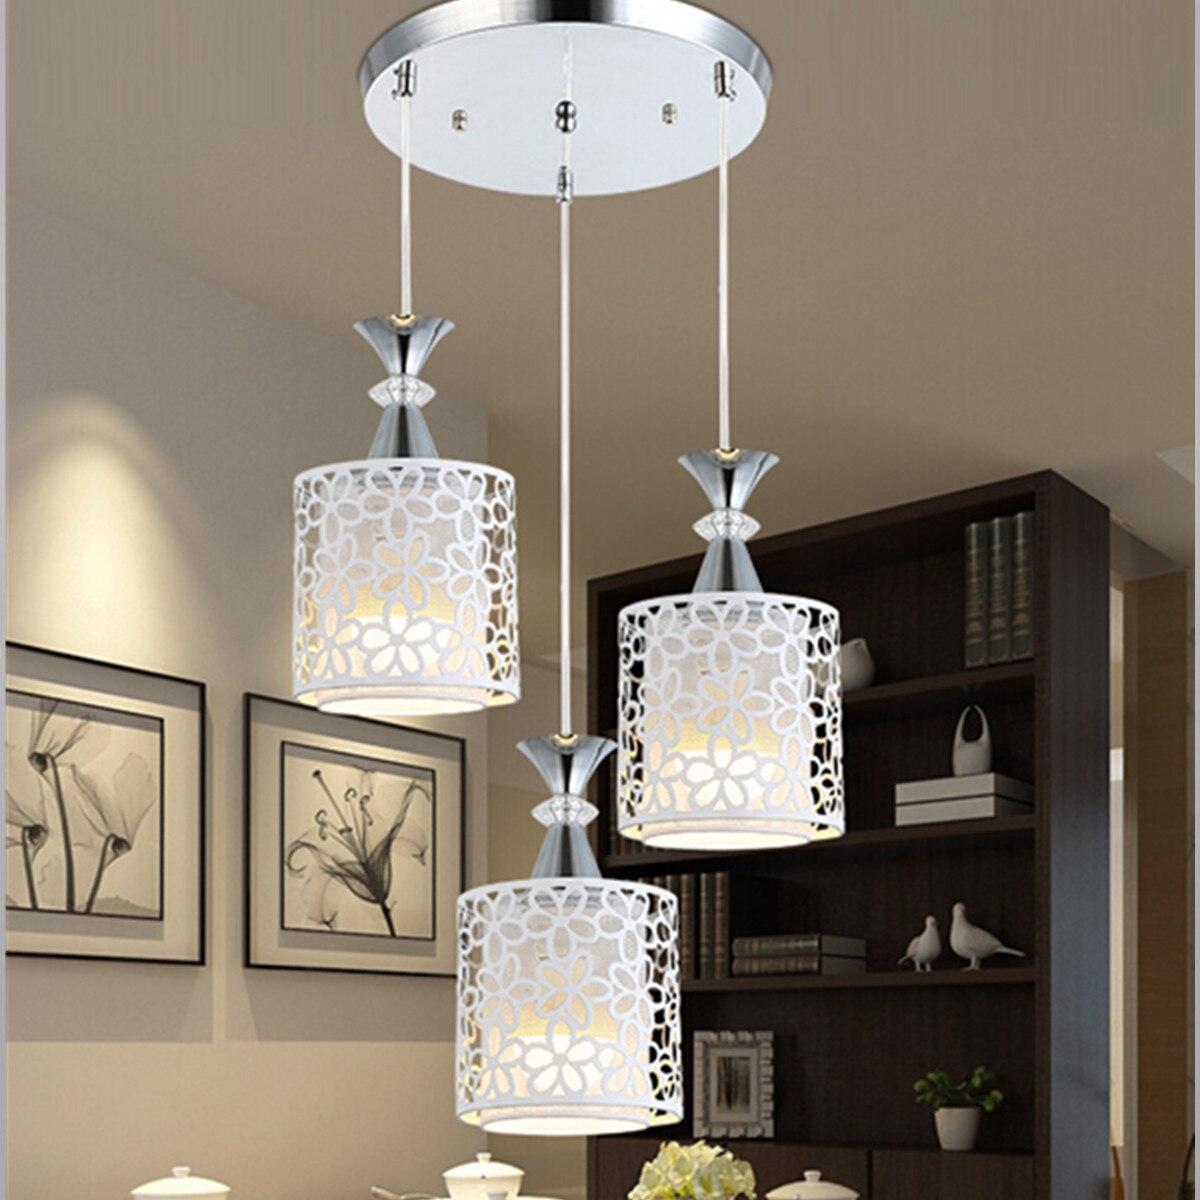 Modern Crystal Ceiling Lamps LED Lamps Living Room Dining Room Glass Ceiling lamp led lustre light Crystal Ceiling Lamp | Crystal Ceiling Lights | Modern LED Lamps For Living Room Dining Room Glass Ceiling Lights Voltage 220V